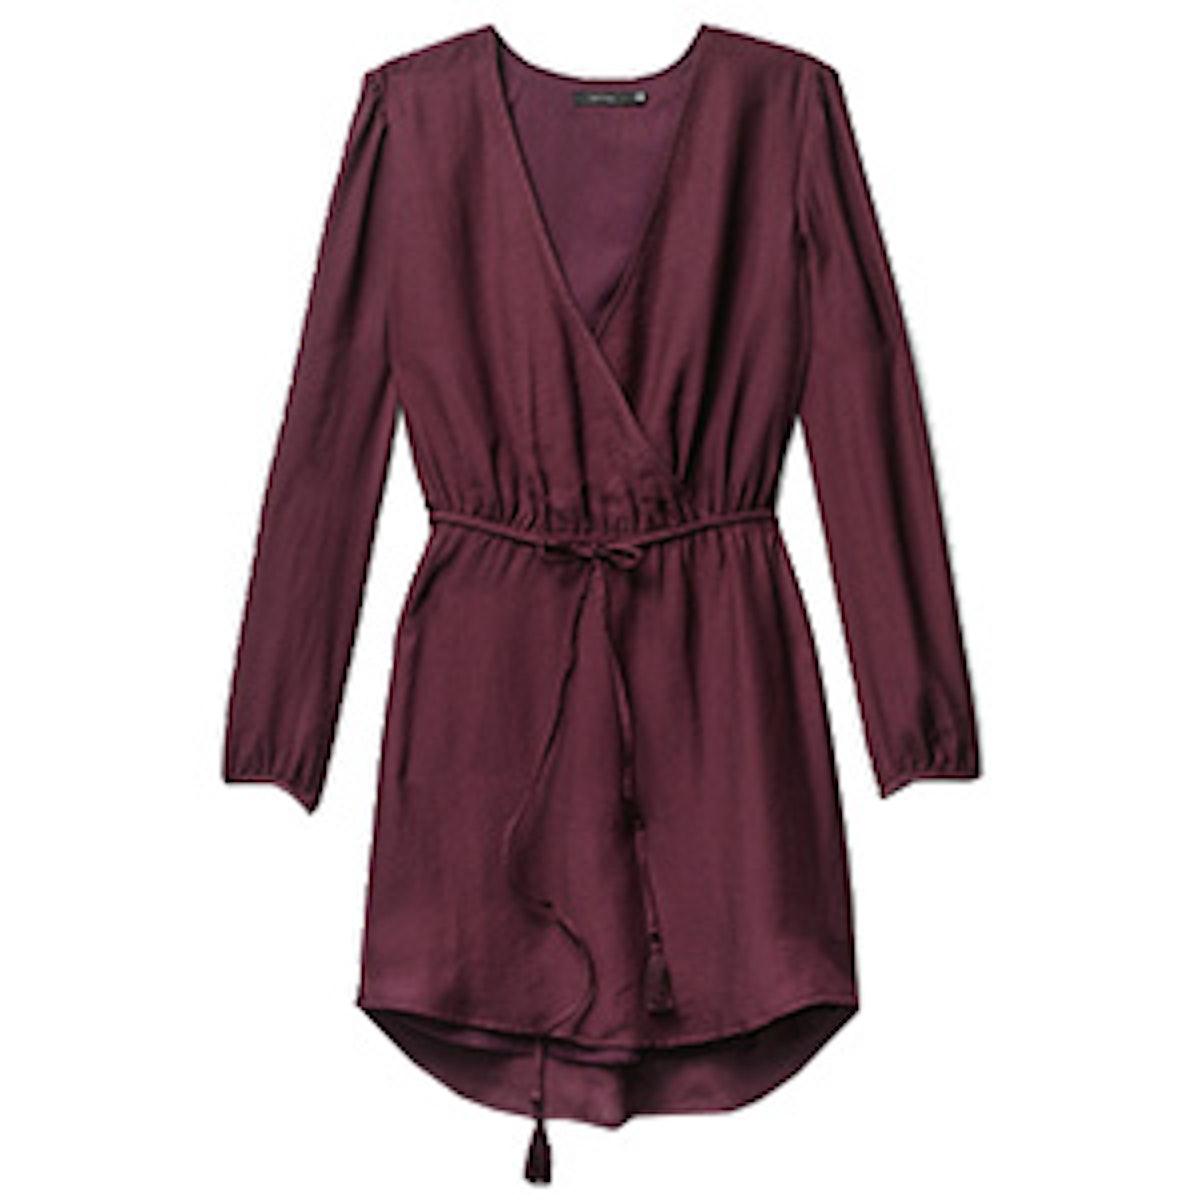 Basing Dress